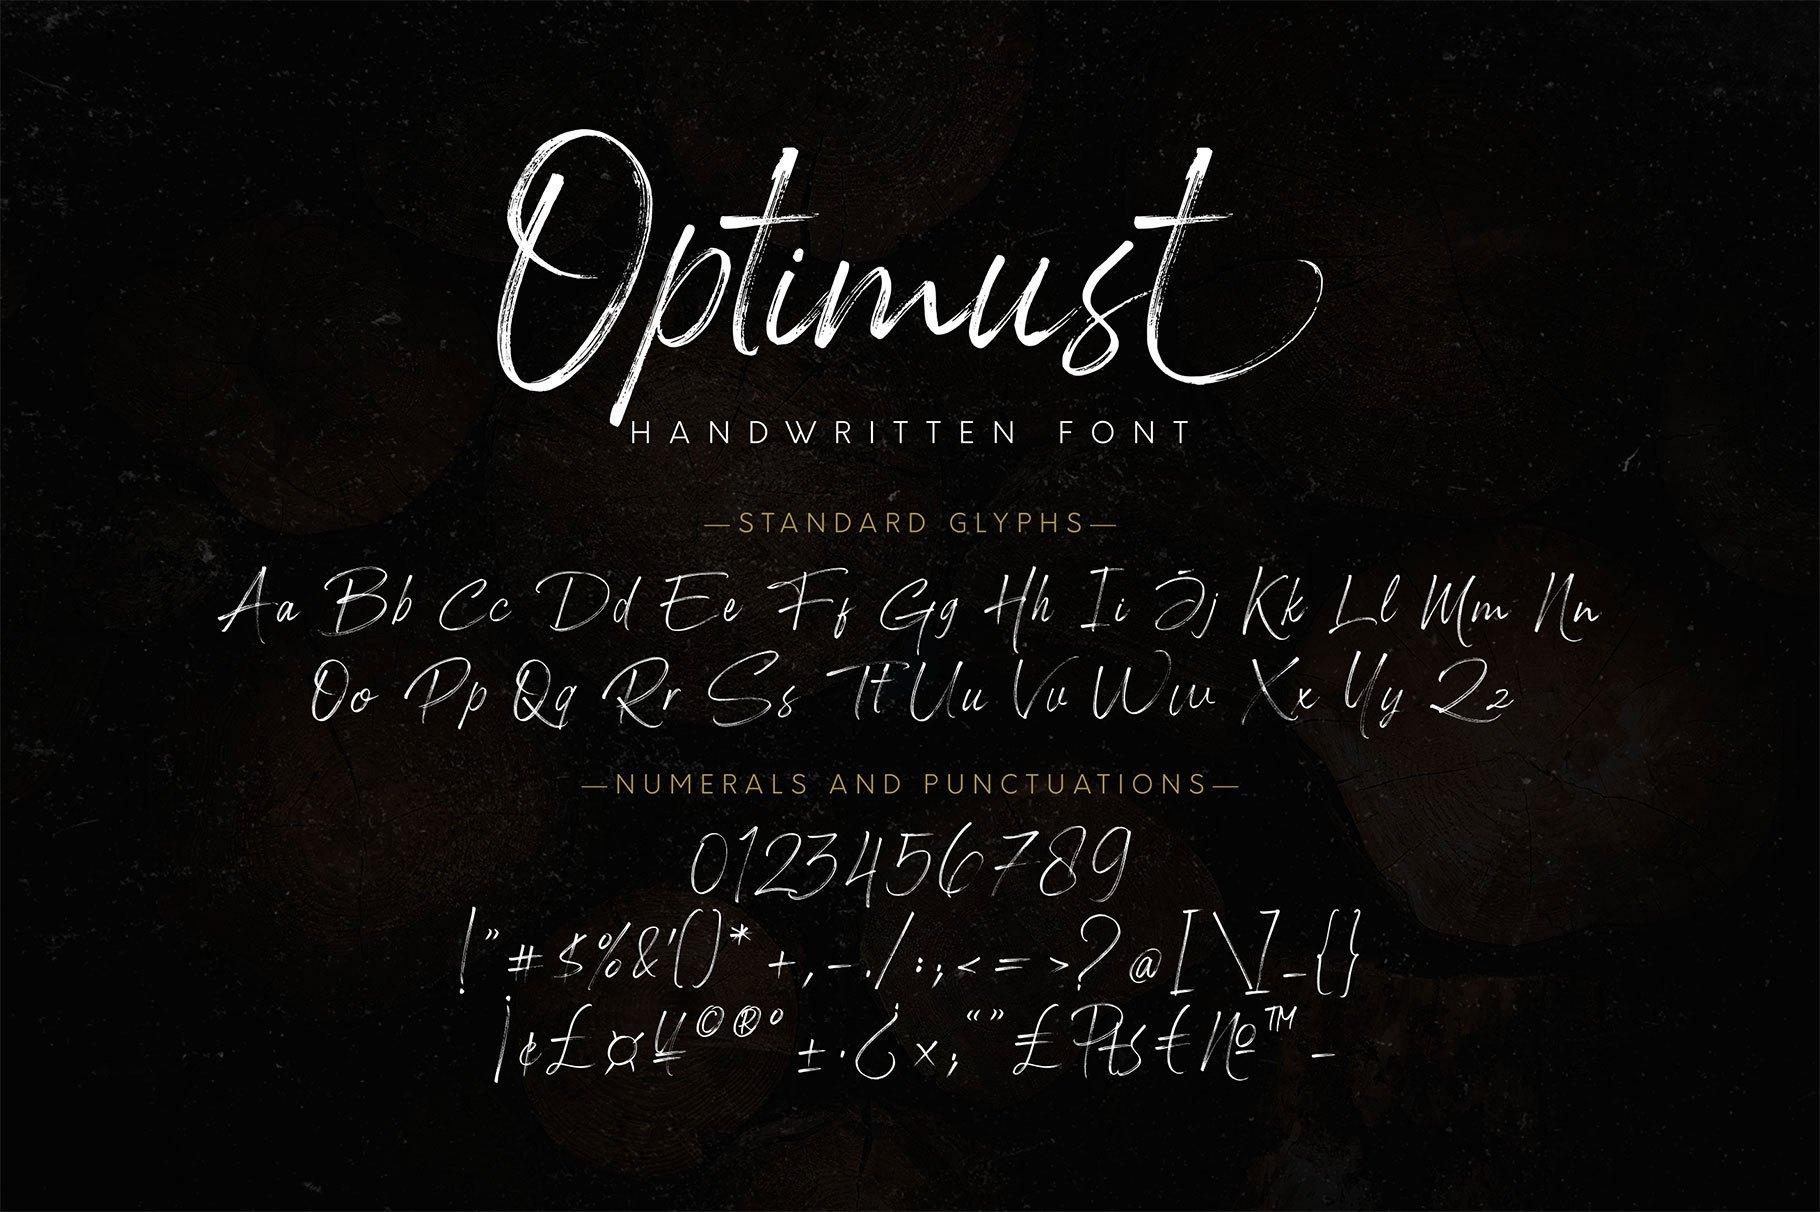 Optimust-Brush-Script-Font-3